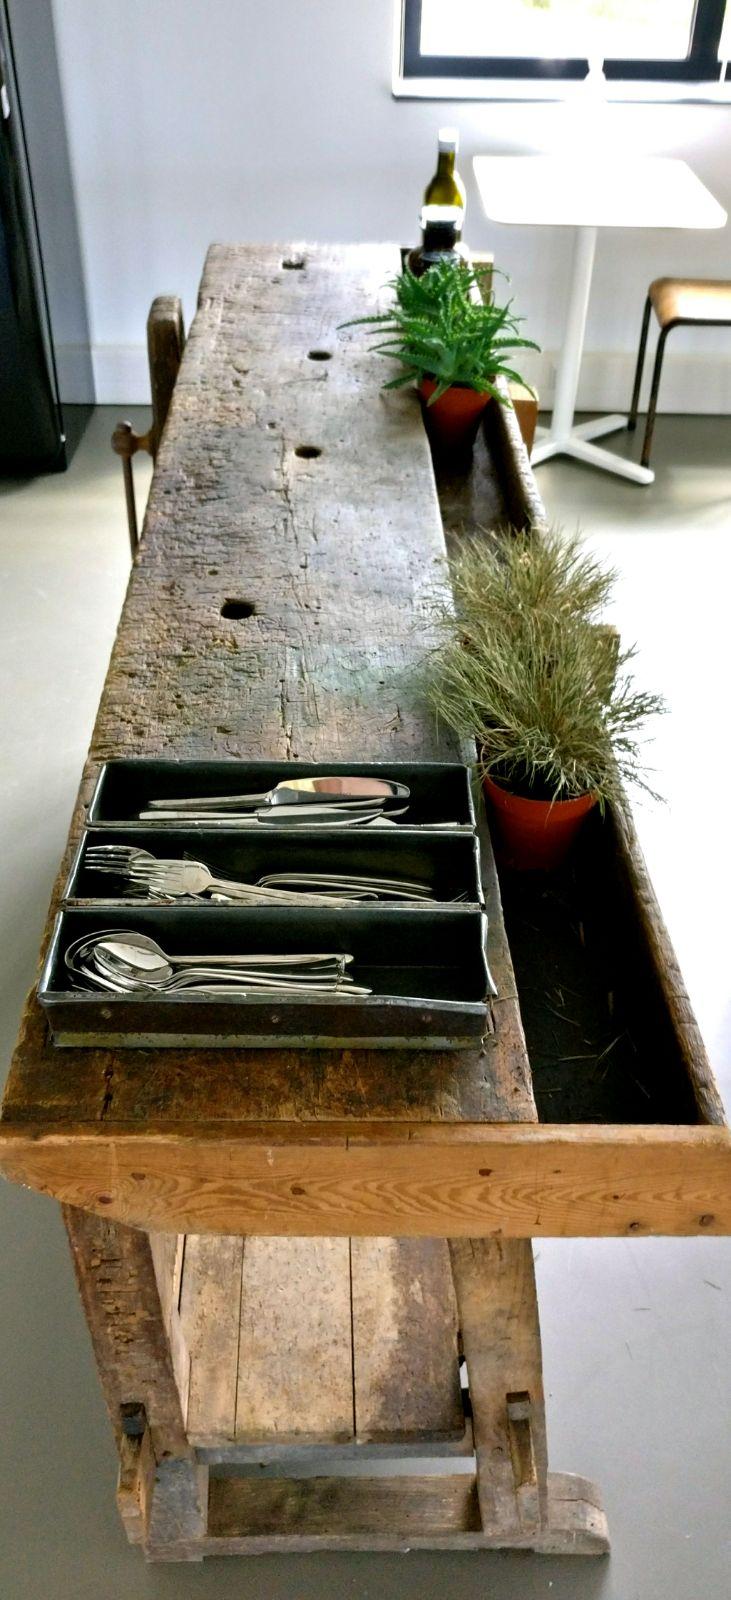 moderne kantoorruimte franse werkbank vintage licht keuken planten.jpg